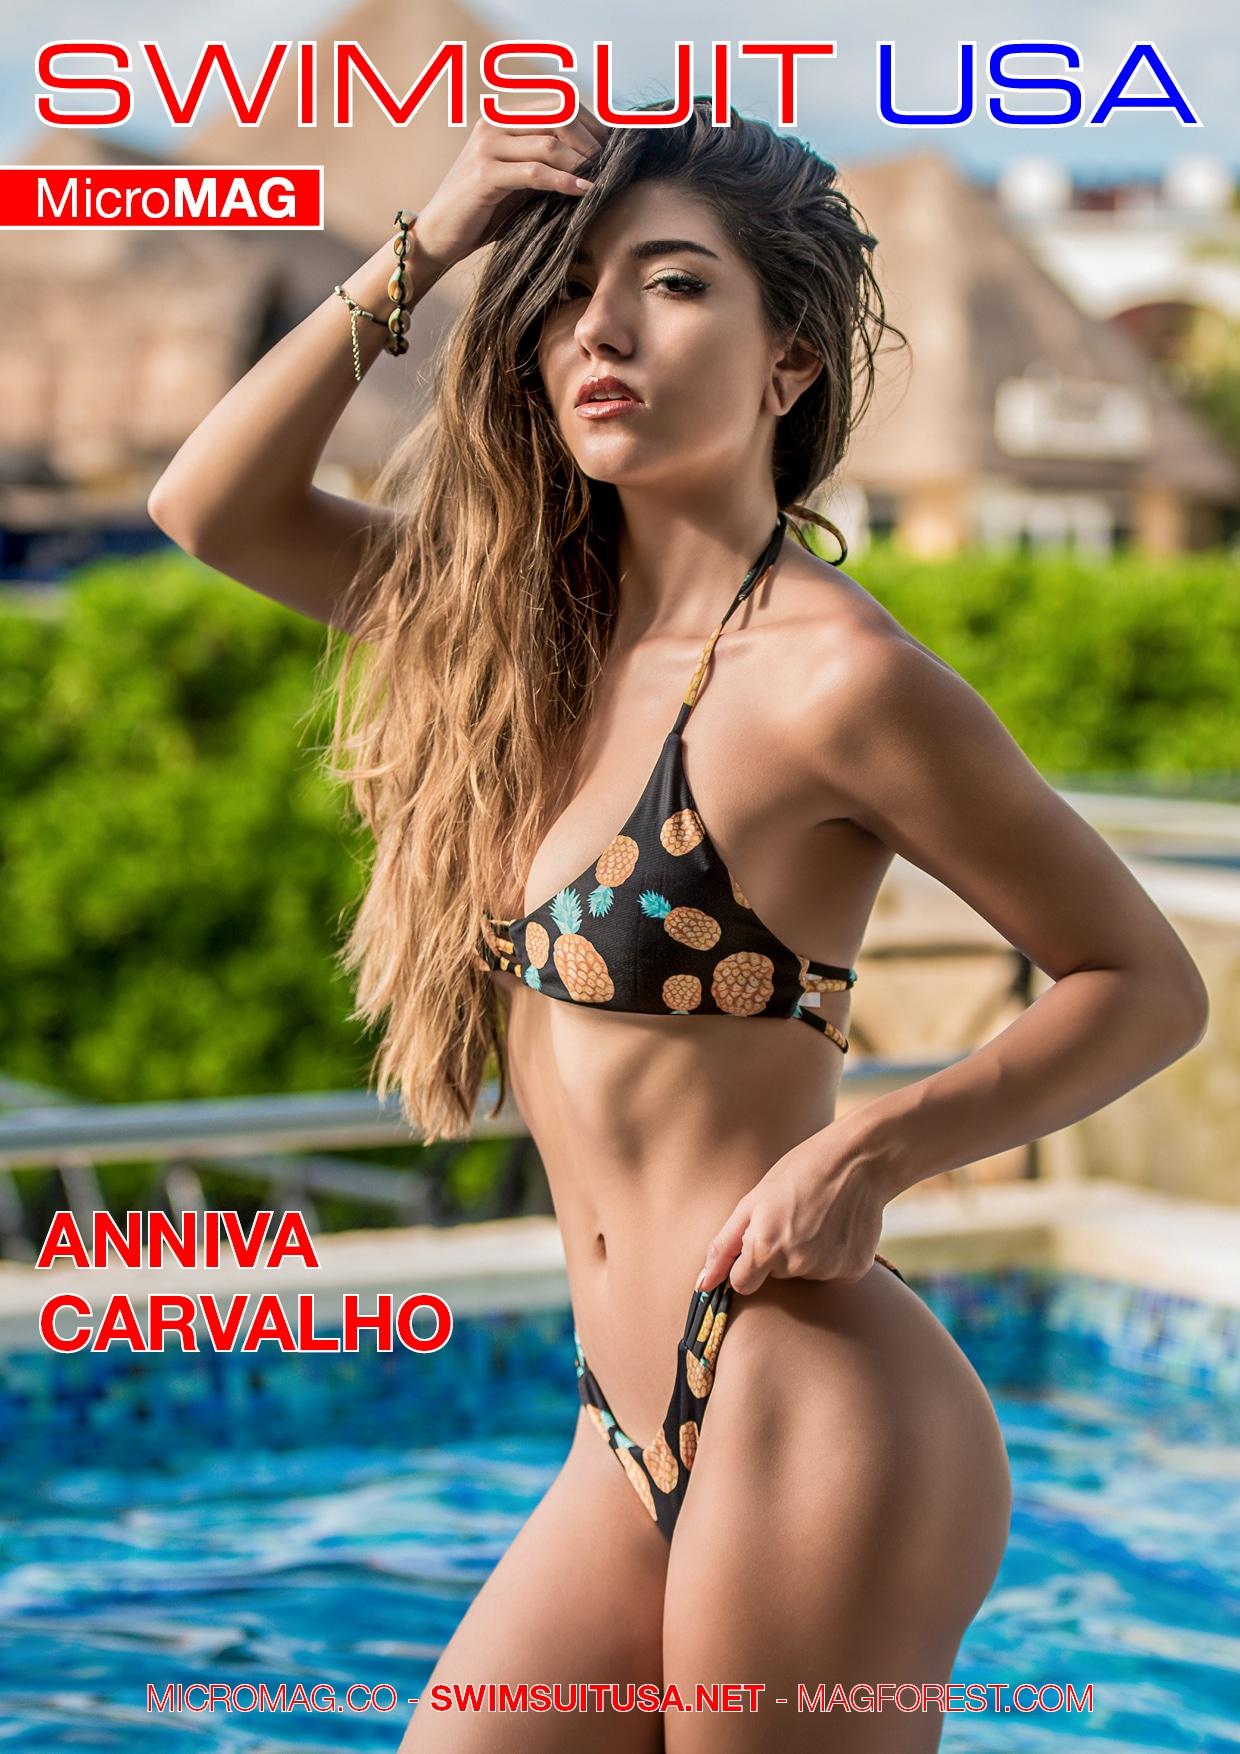 Swimsuit Usa Micromag – Anniva Carvalho